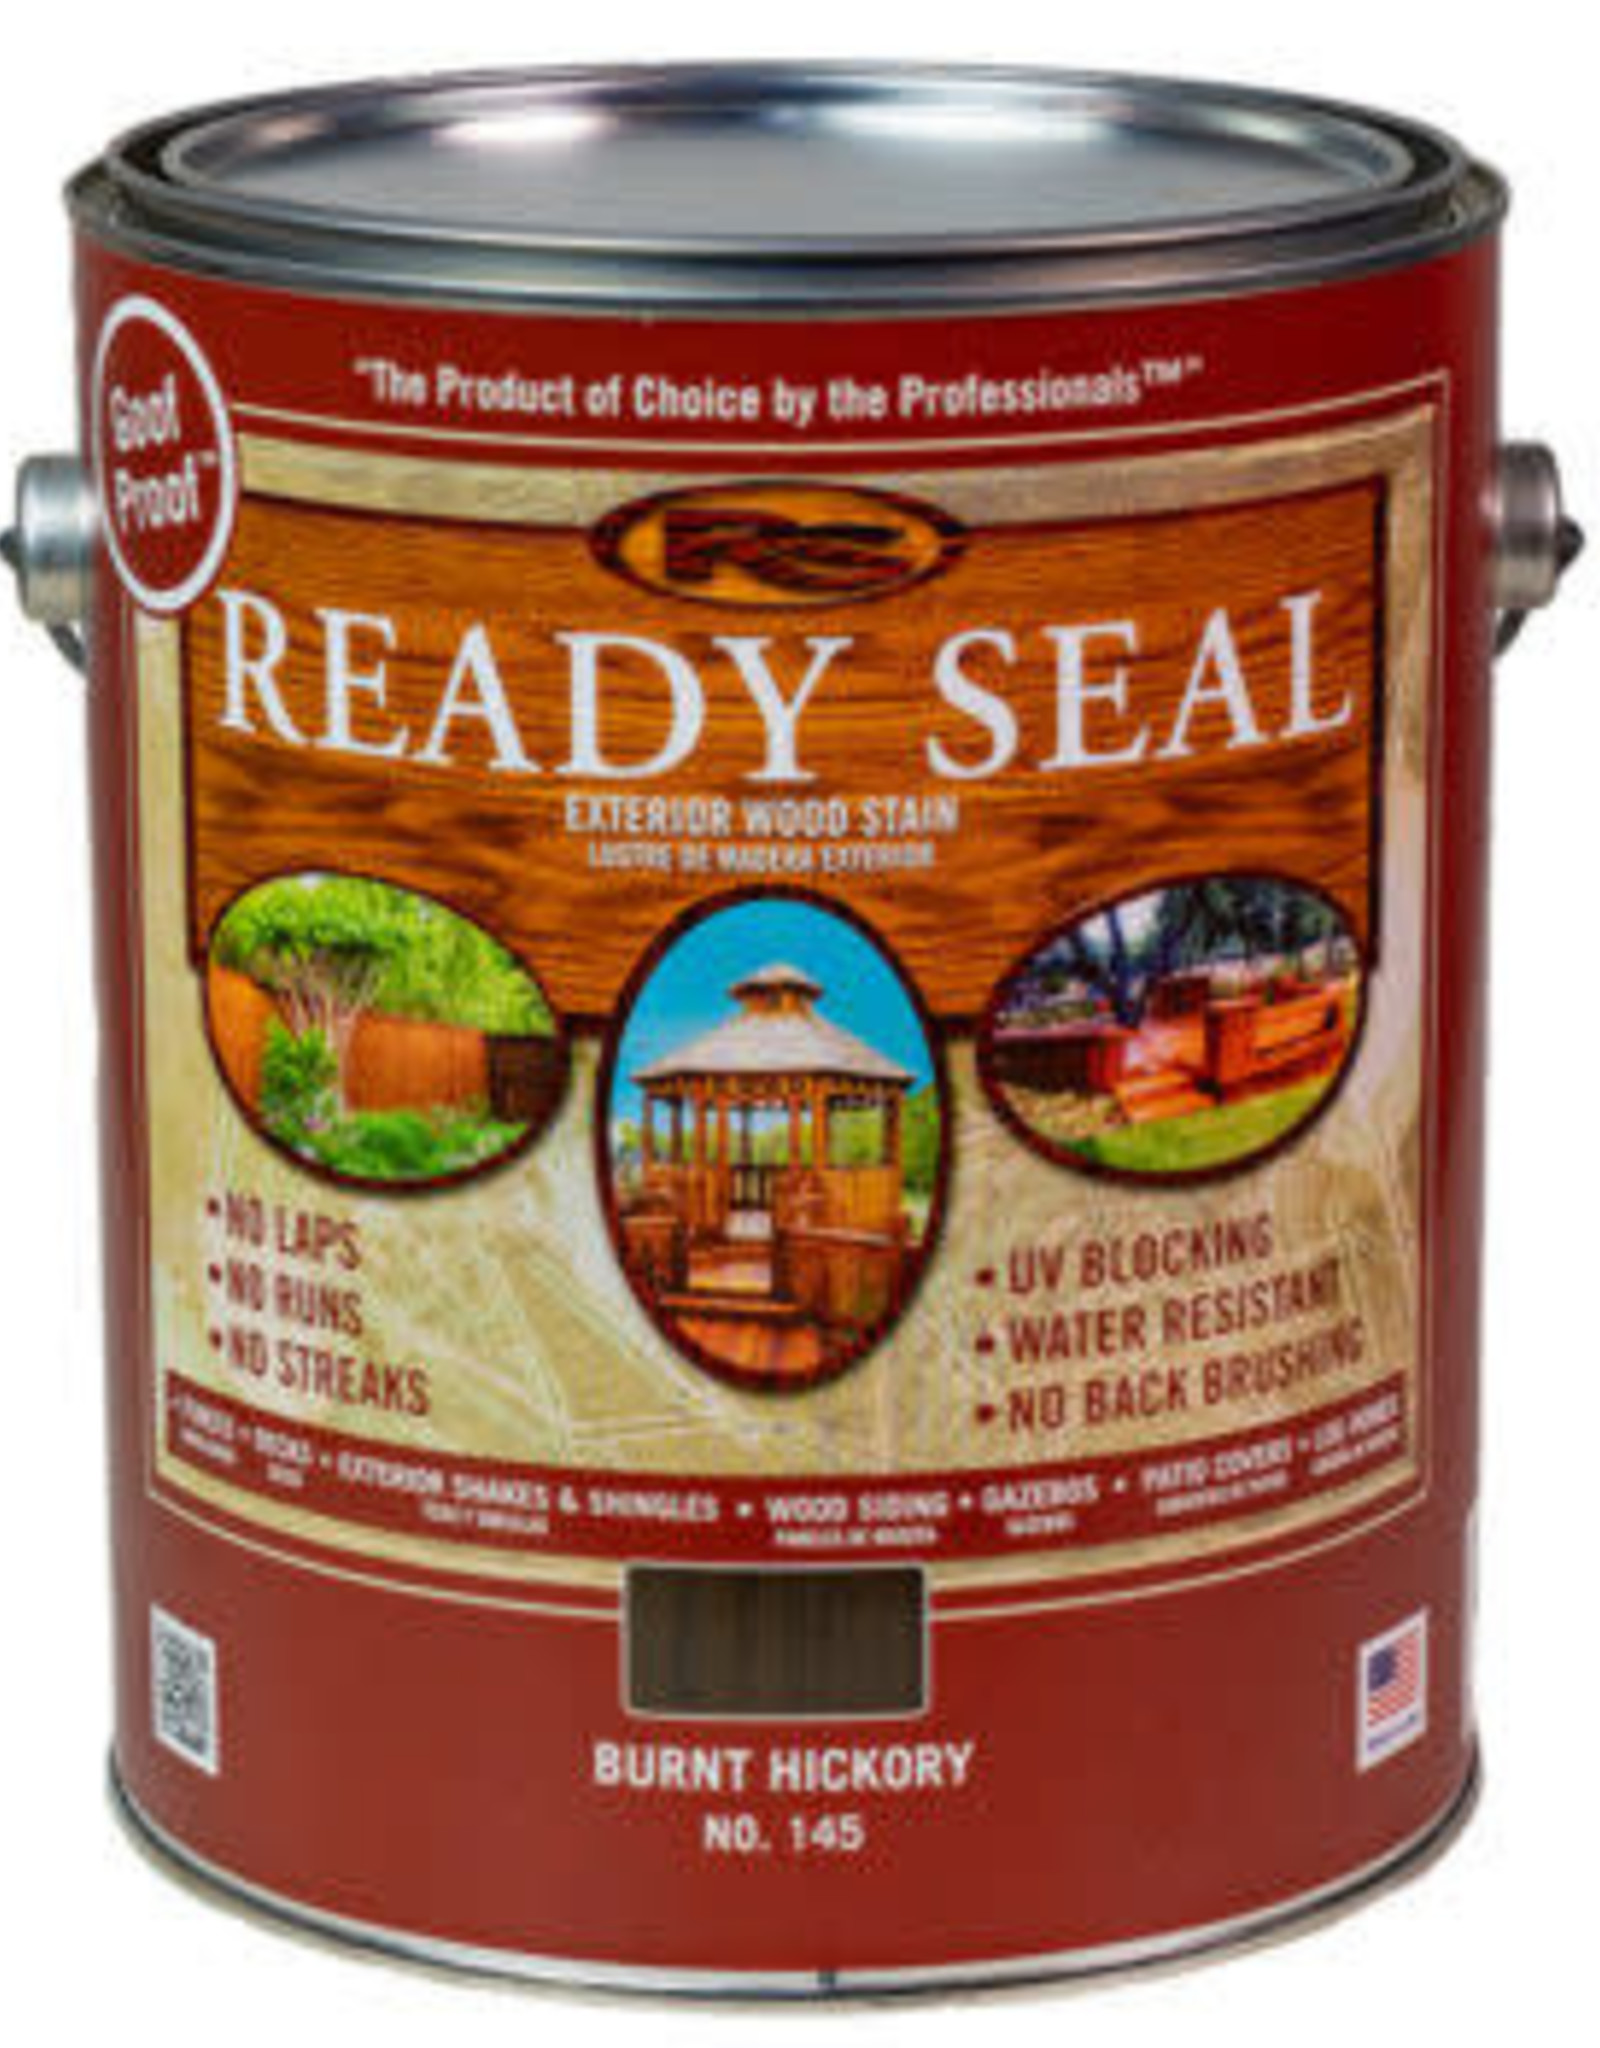 Ready Seal Ready Seal - 1 - Gallon - Burnt Hickory